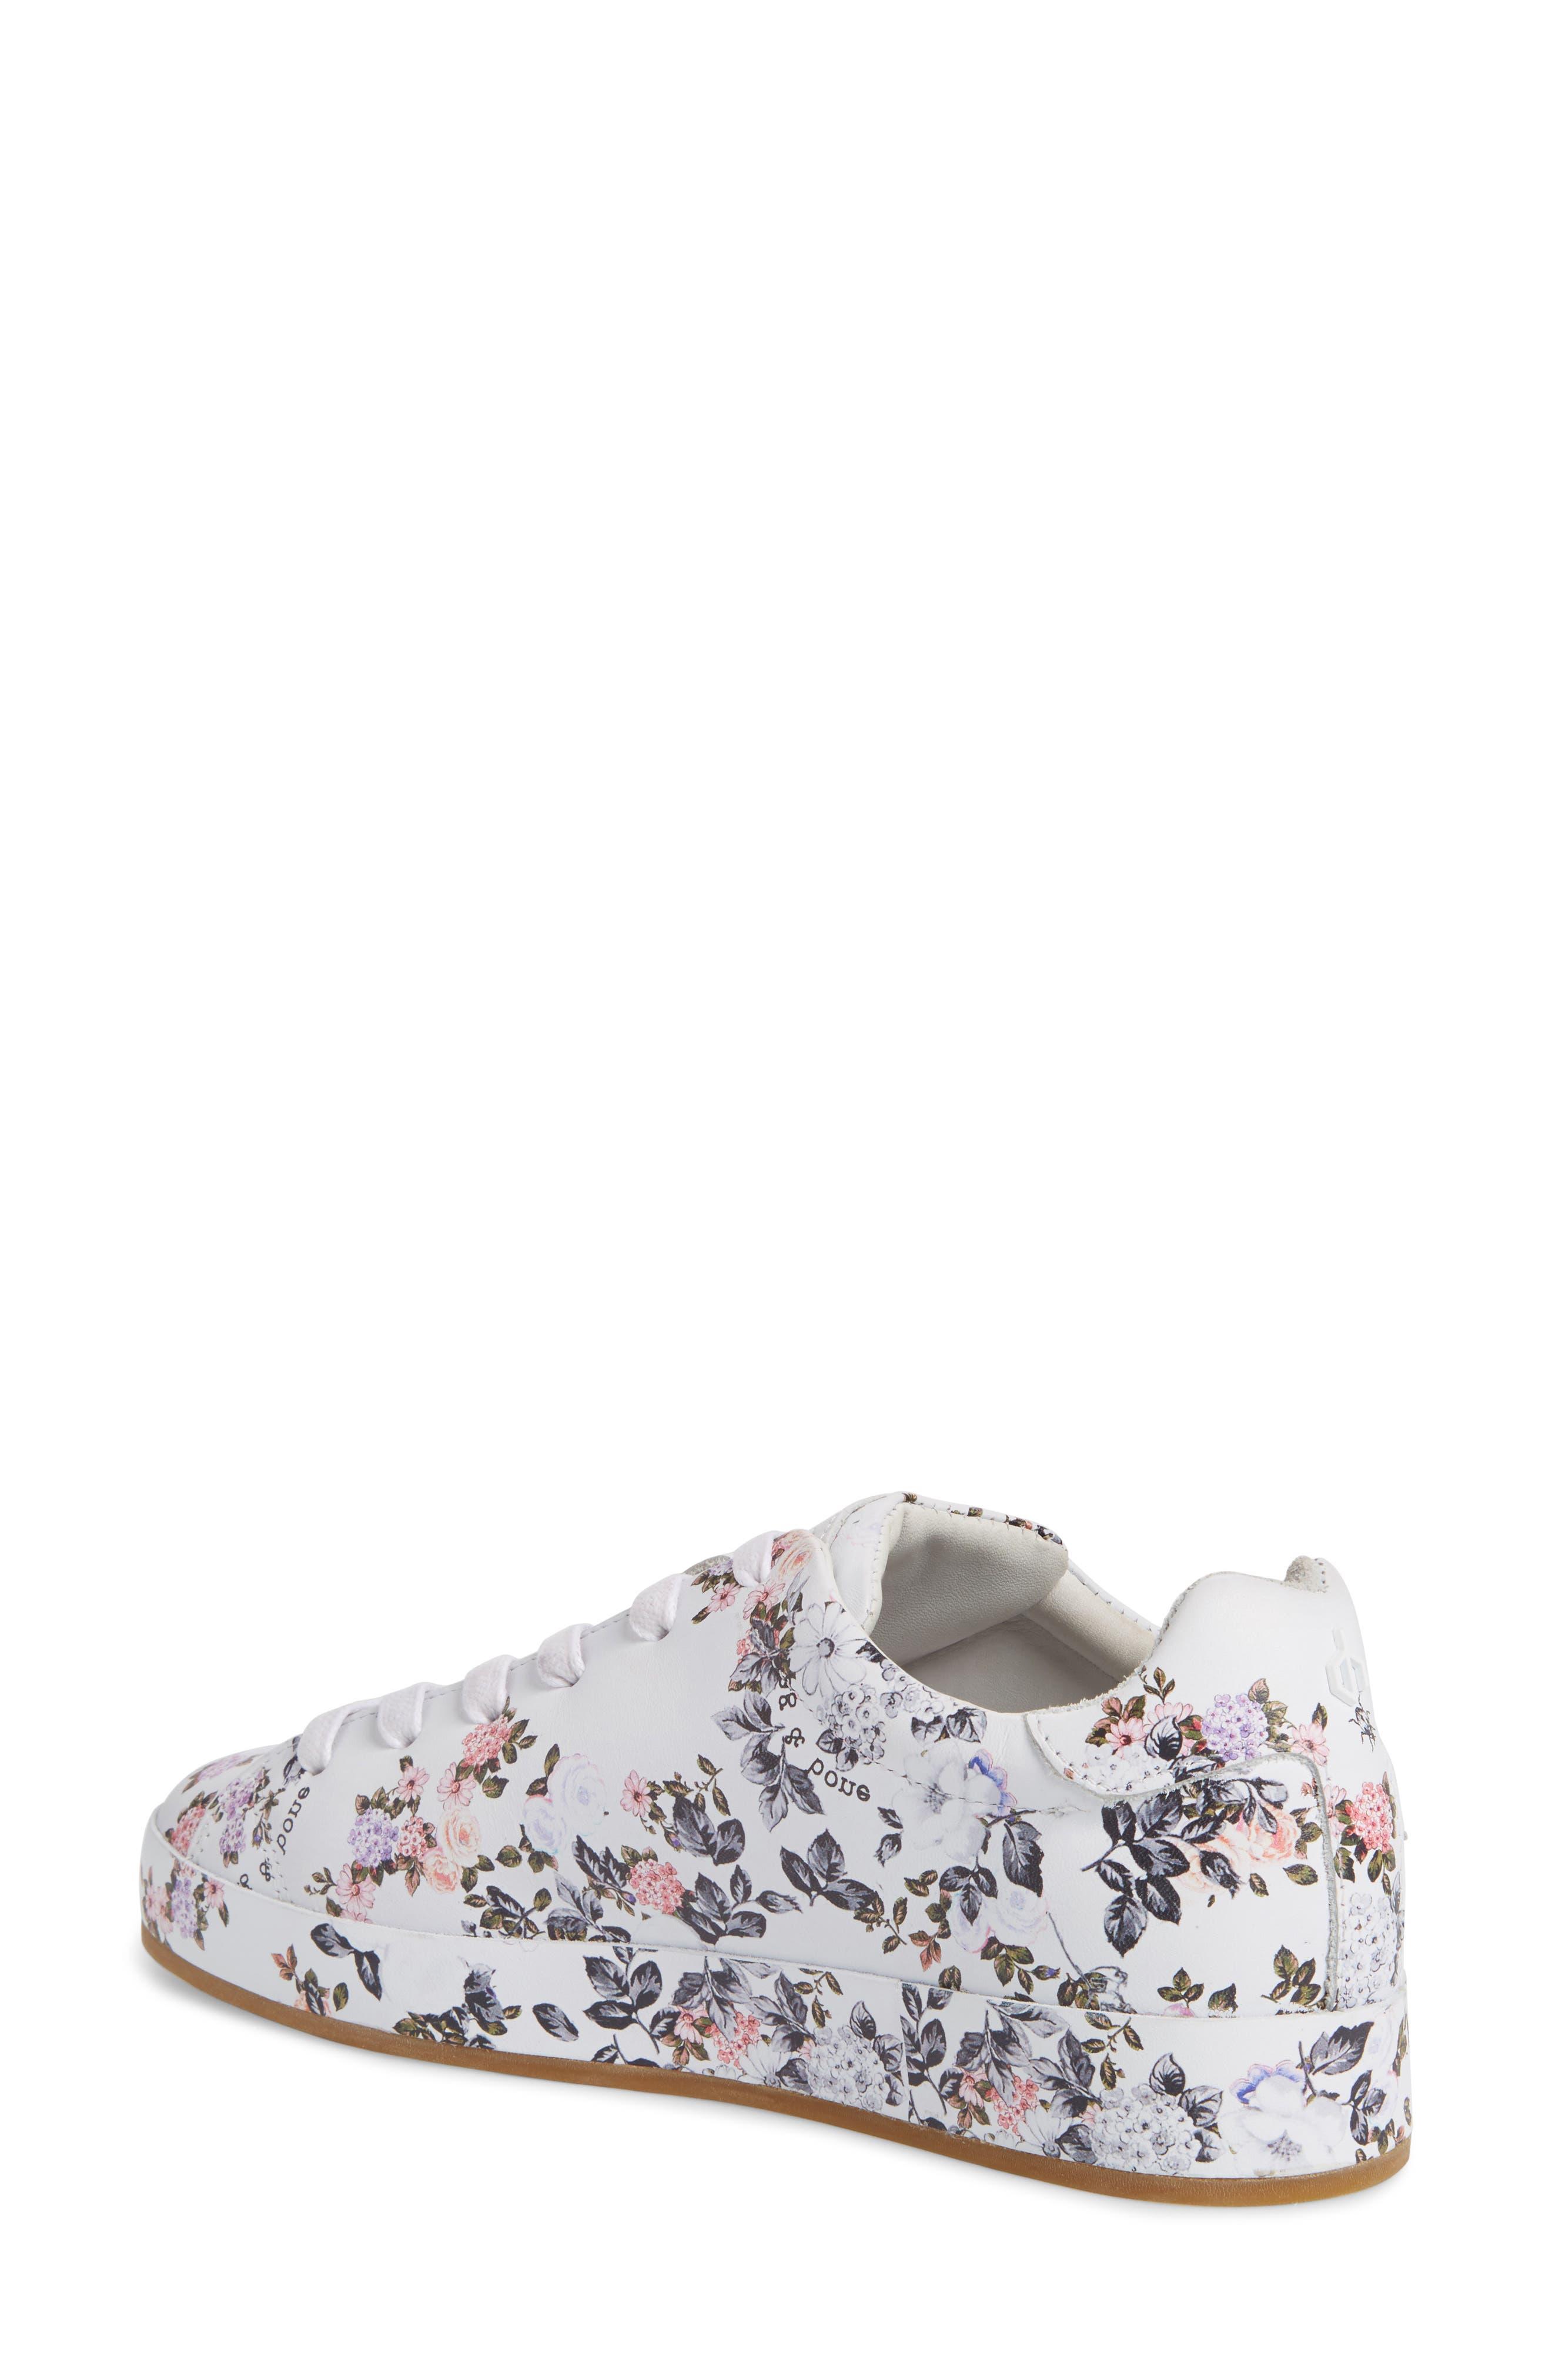 RB1 Low-Top Sneaker,                             Alternate thumbnail 2, color,                             Garden Florl